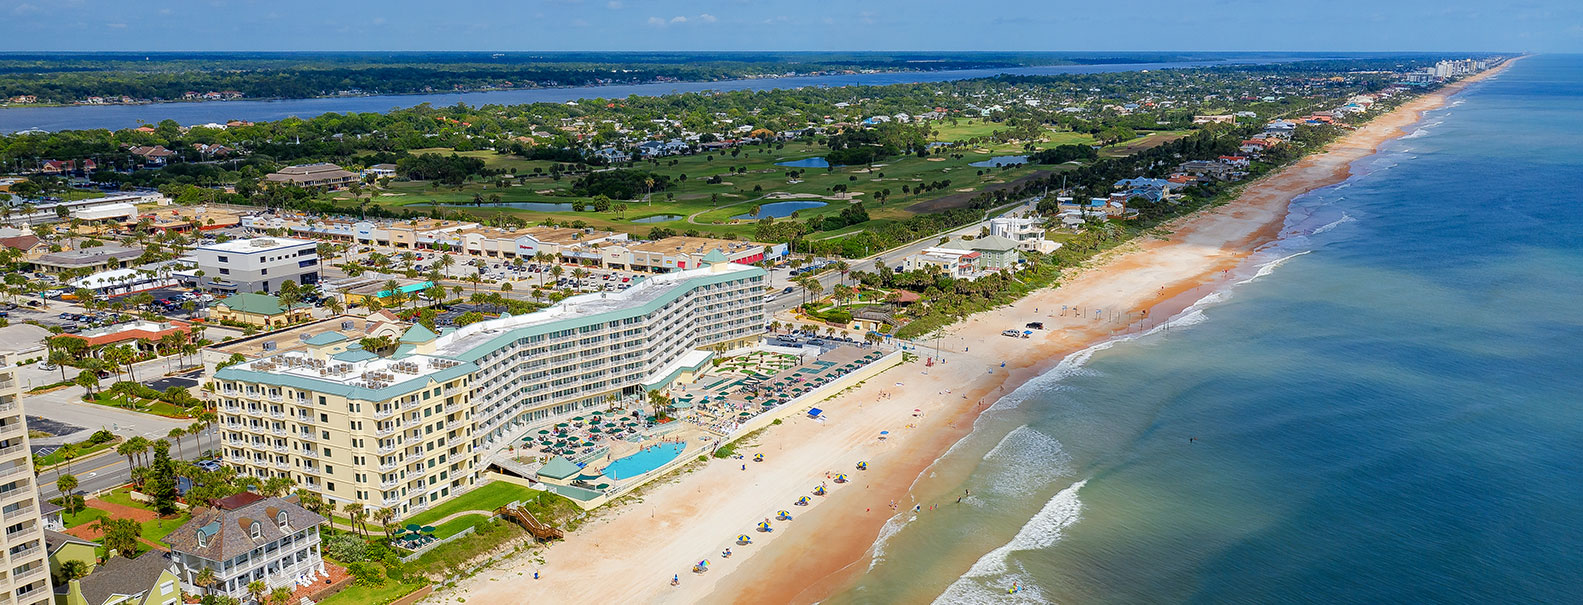 Spinnaker Resorts Update Winter 2020 – Ormand Beach